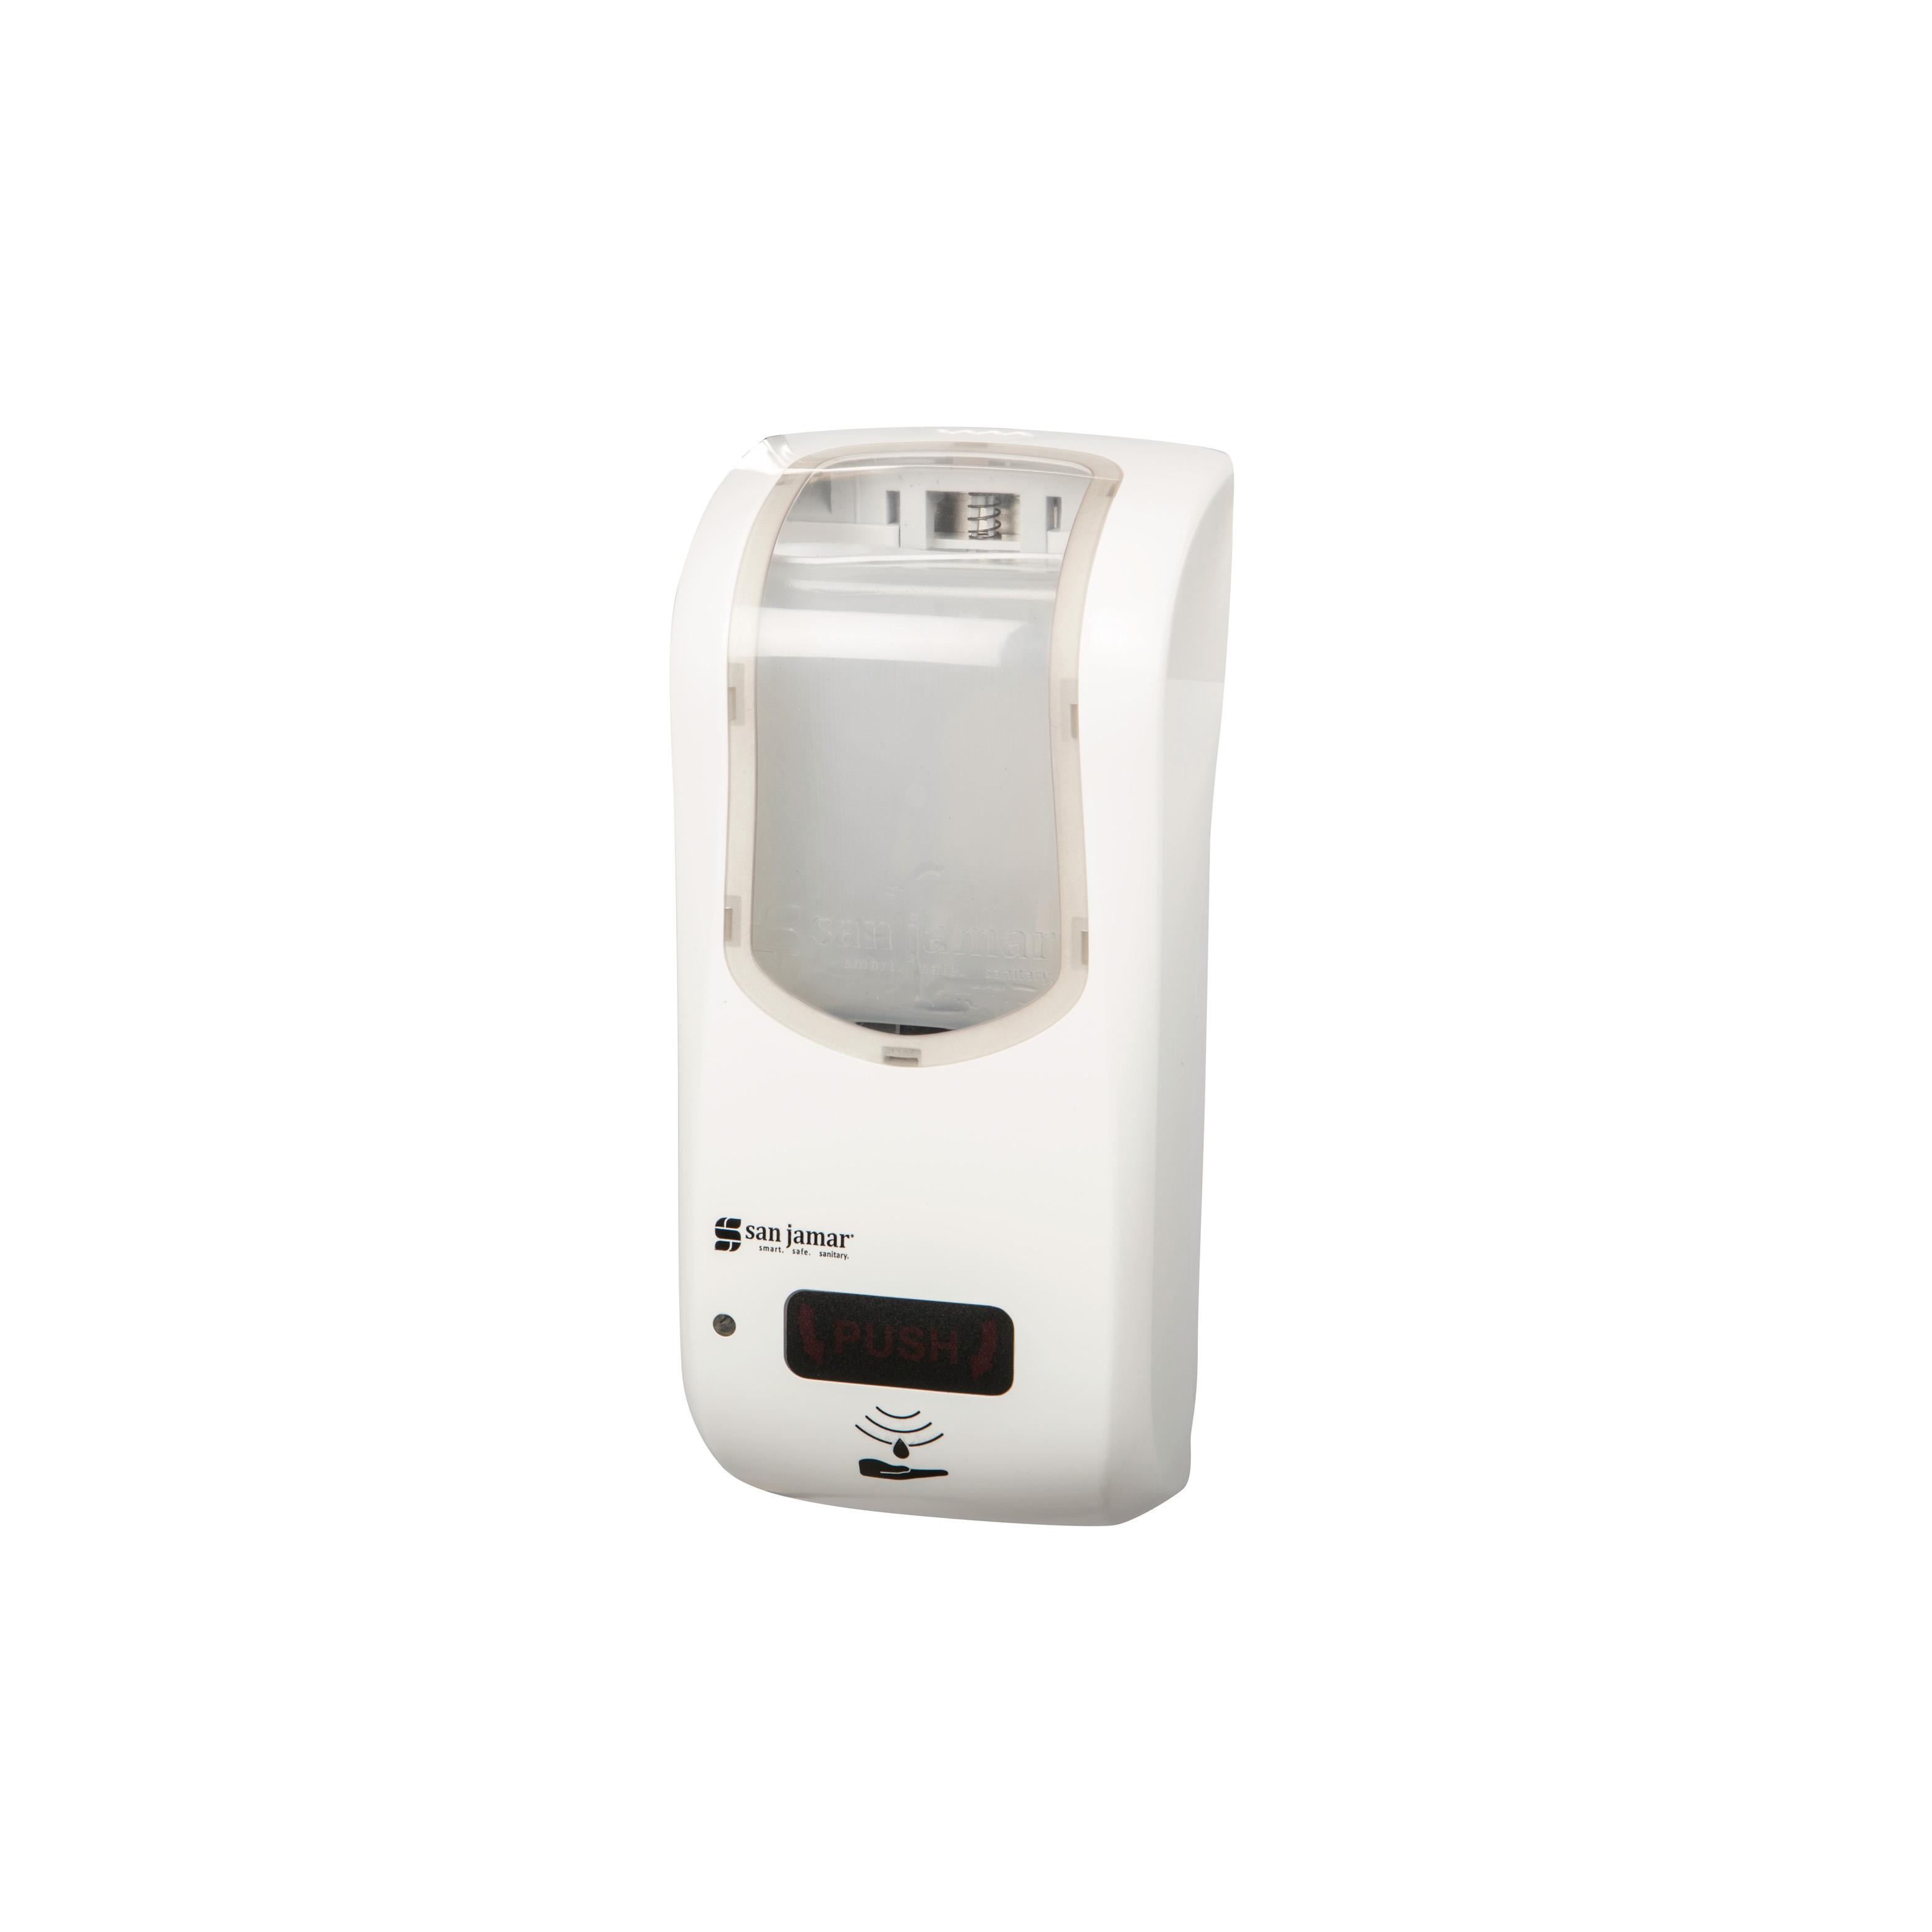 San Jamar SHF970WHCL hand soap / sanitizer dispenser